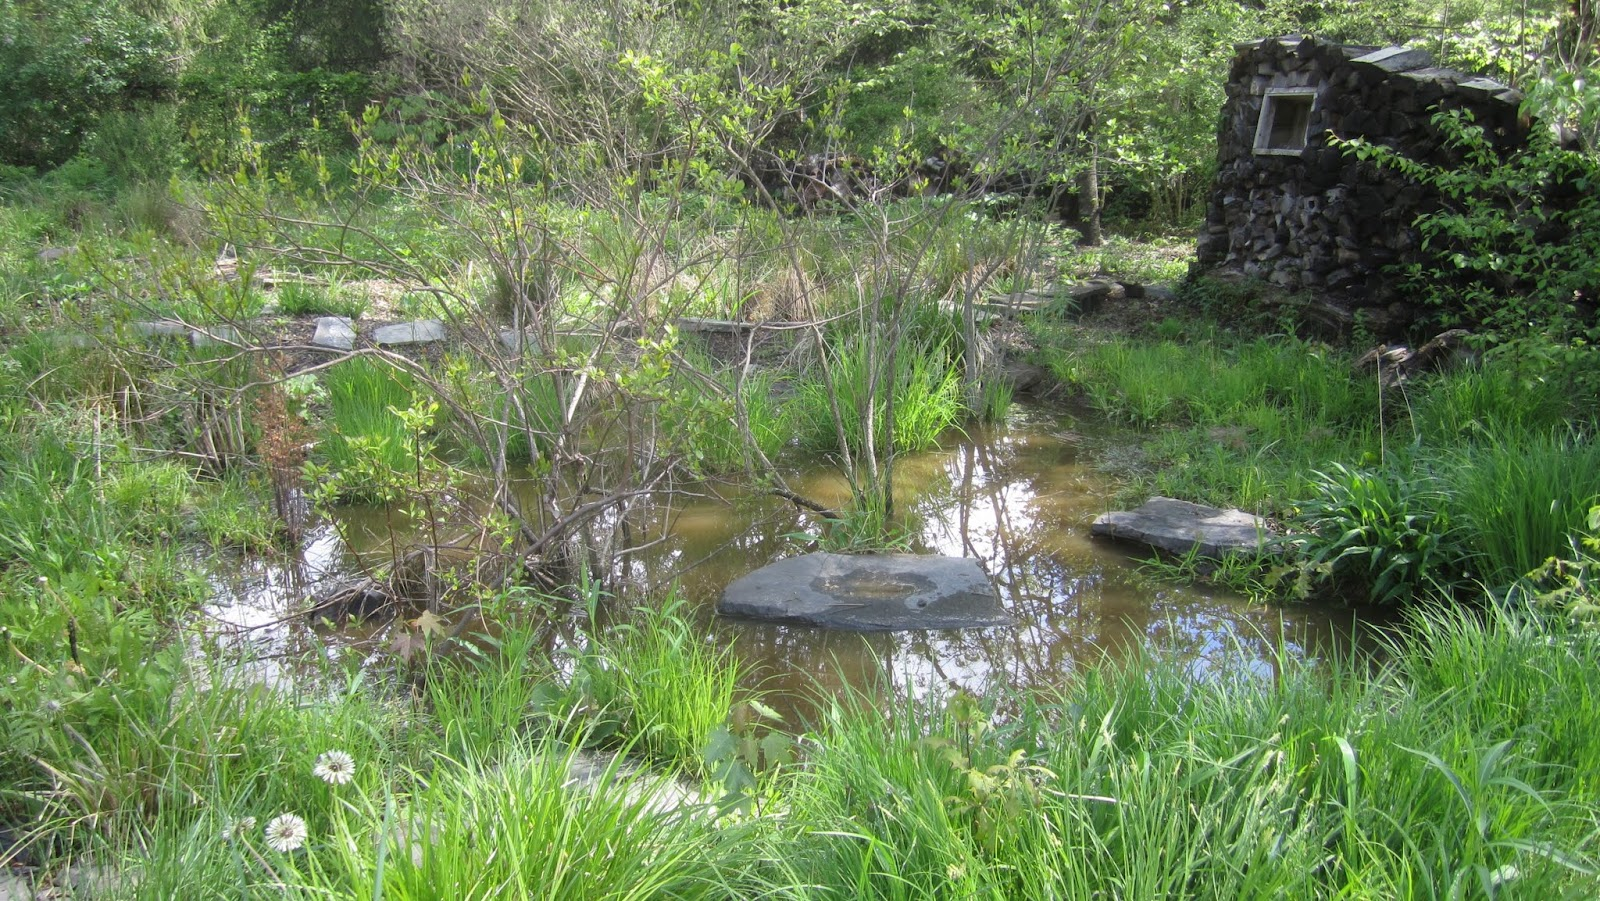 backyard habitat recipe princeton nature notes